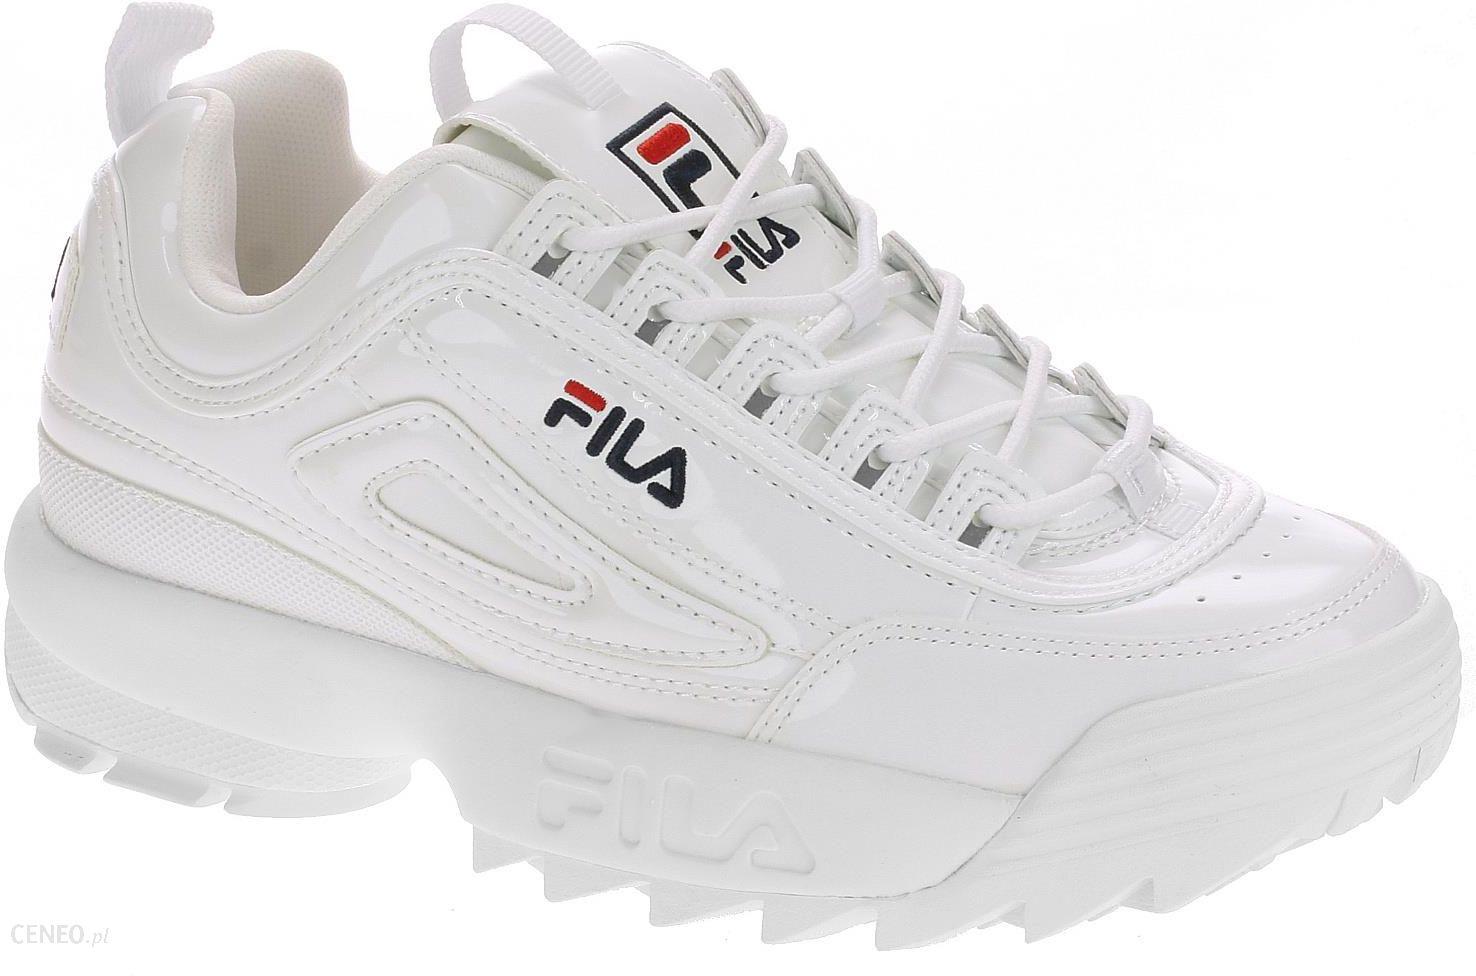 modne buty damskie na obcasie Fila, porównaj ceny i kup online